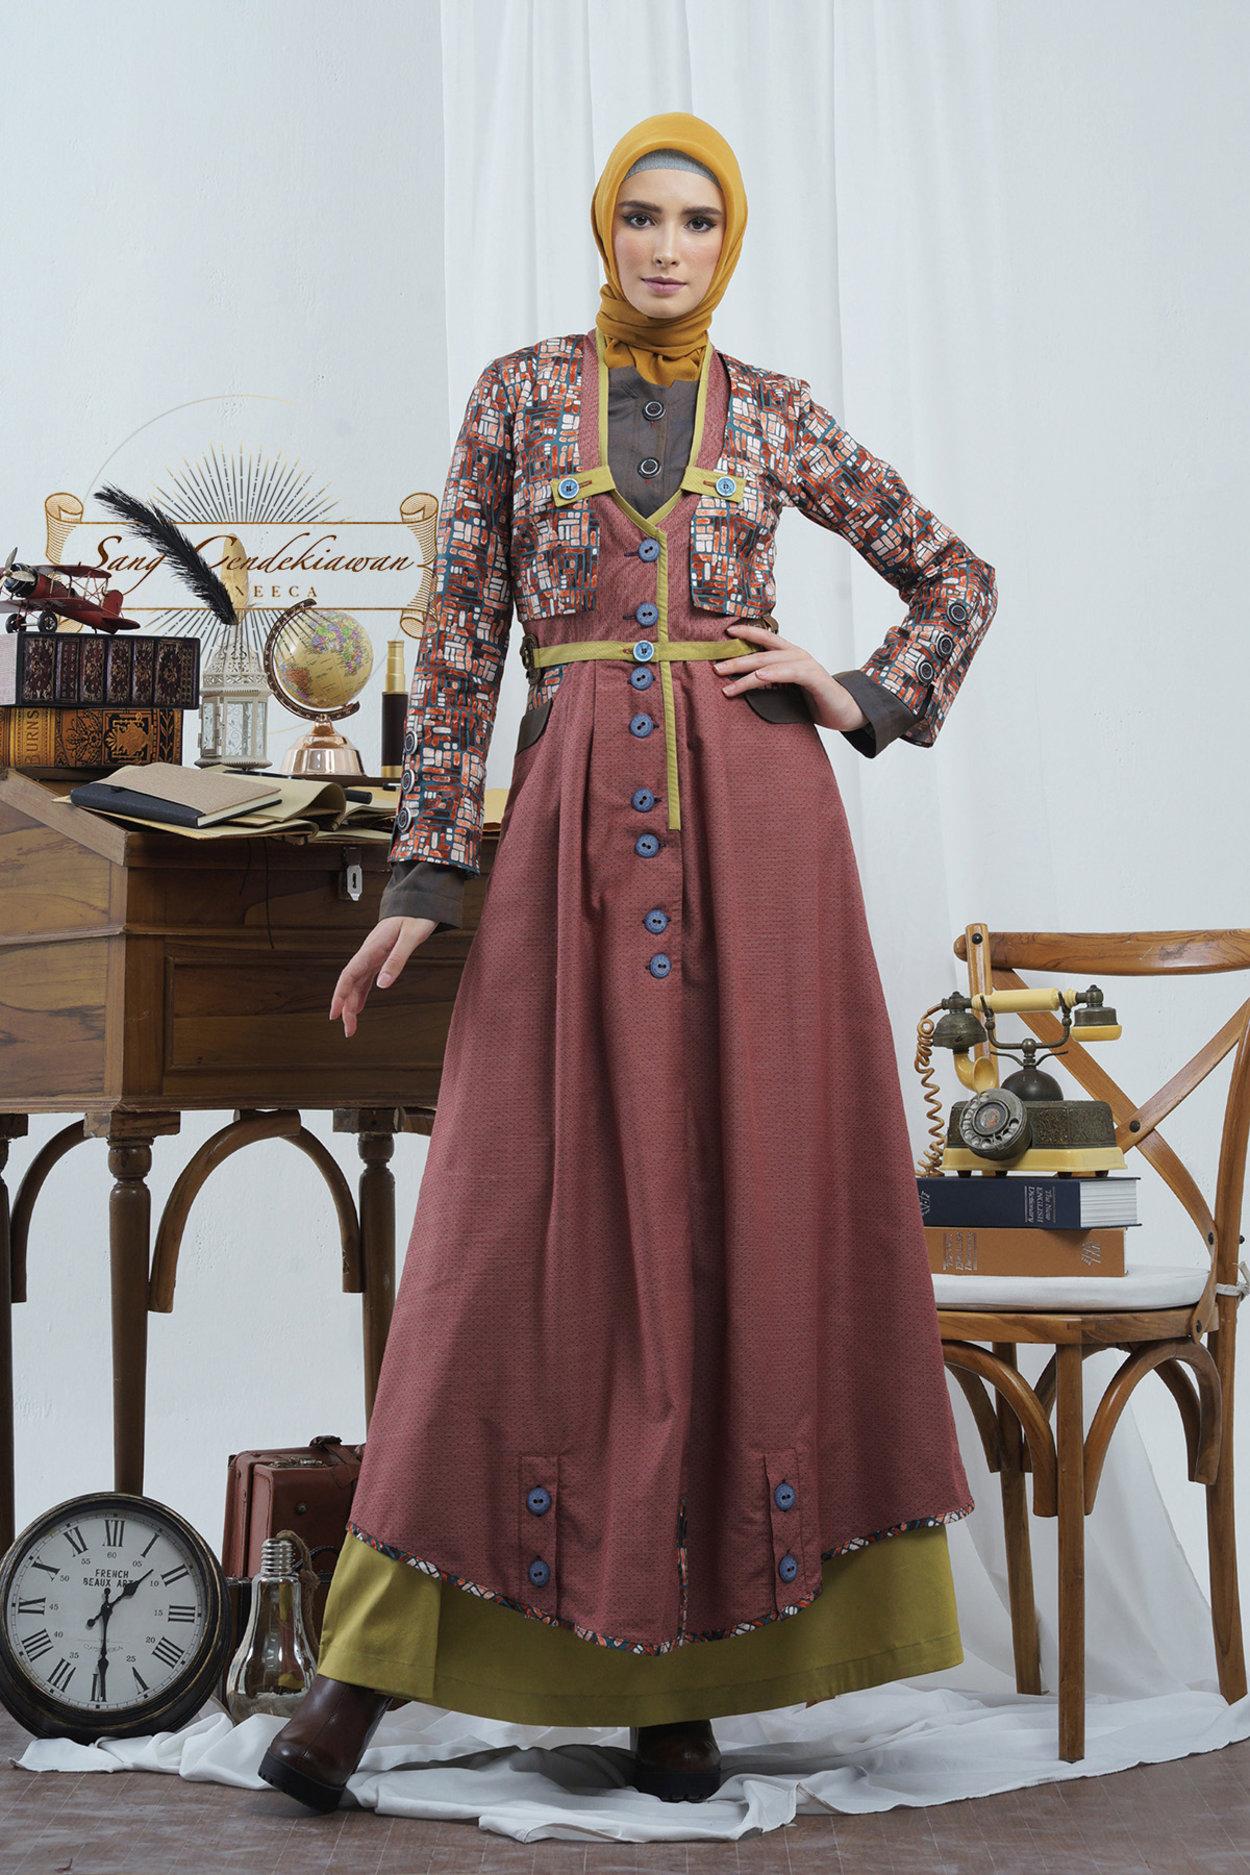 Alur Algebraist T 0619021 Gamis Long Dress Sang Cendikiawan Tuneeca